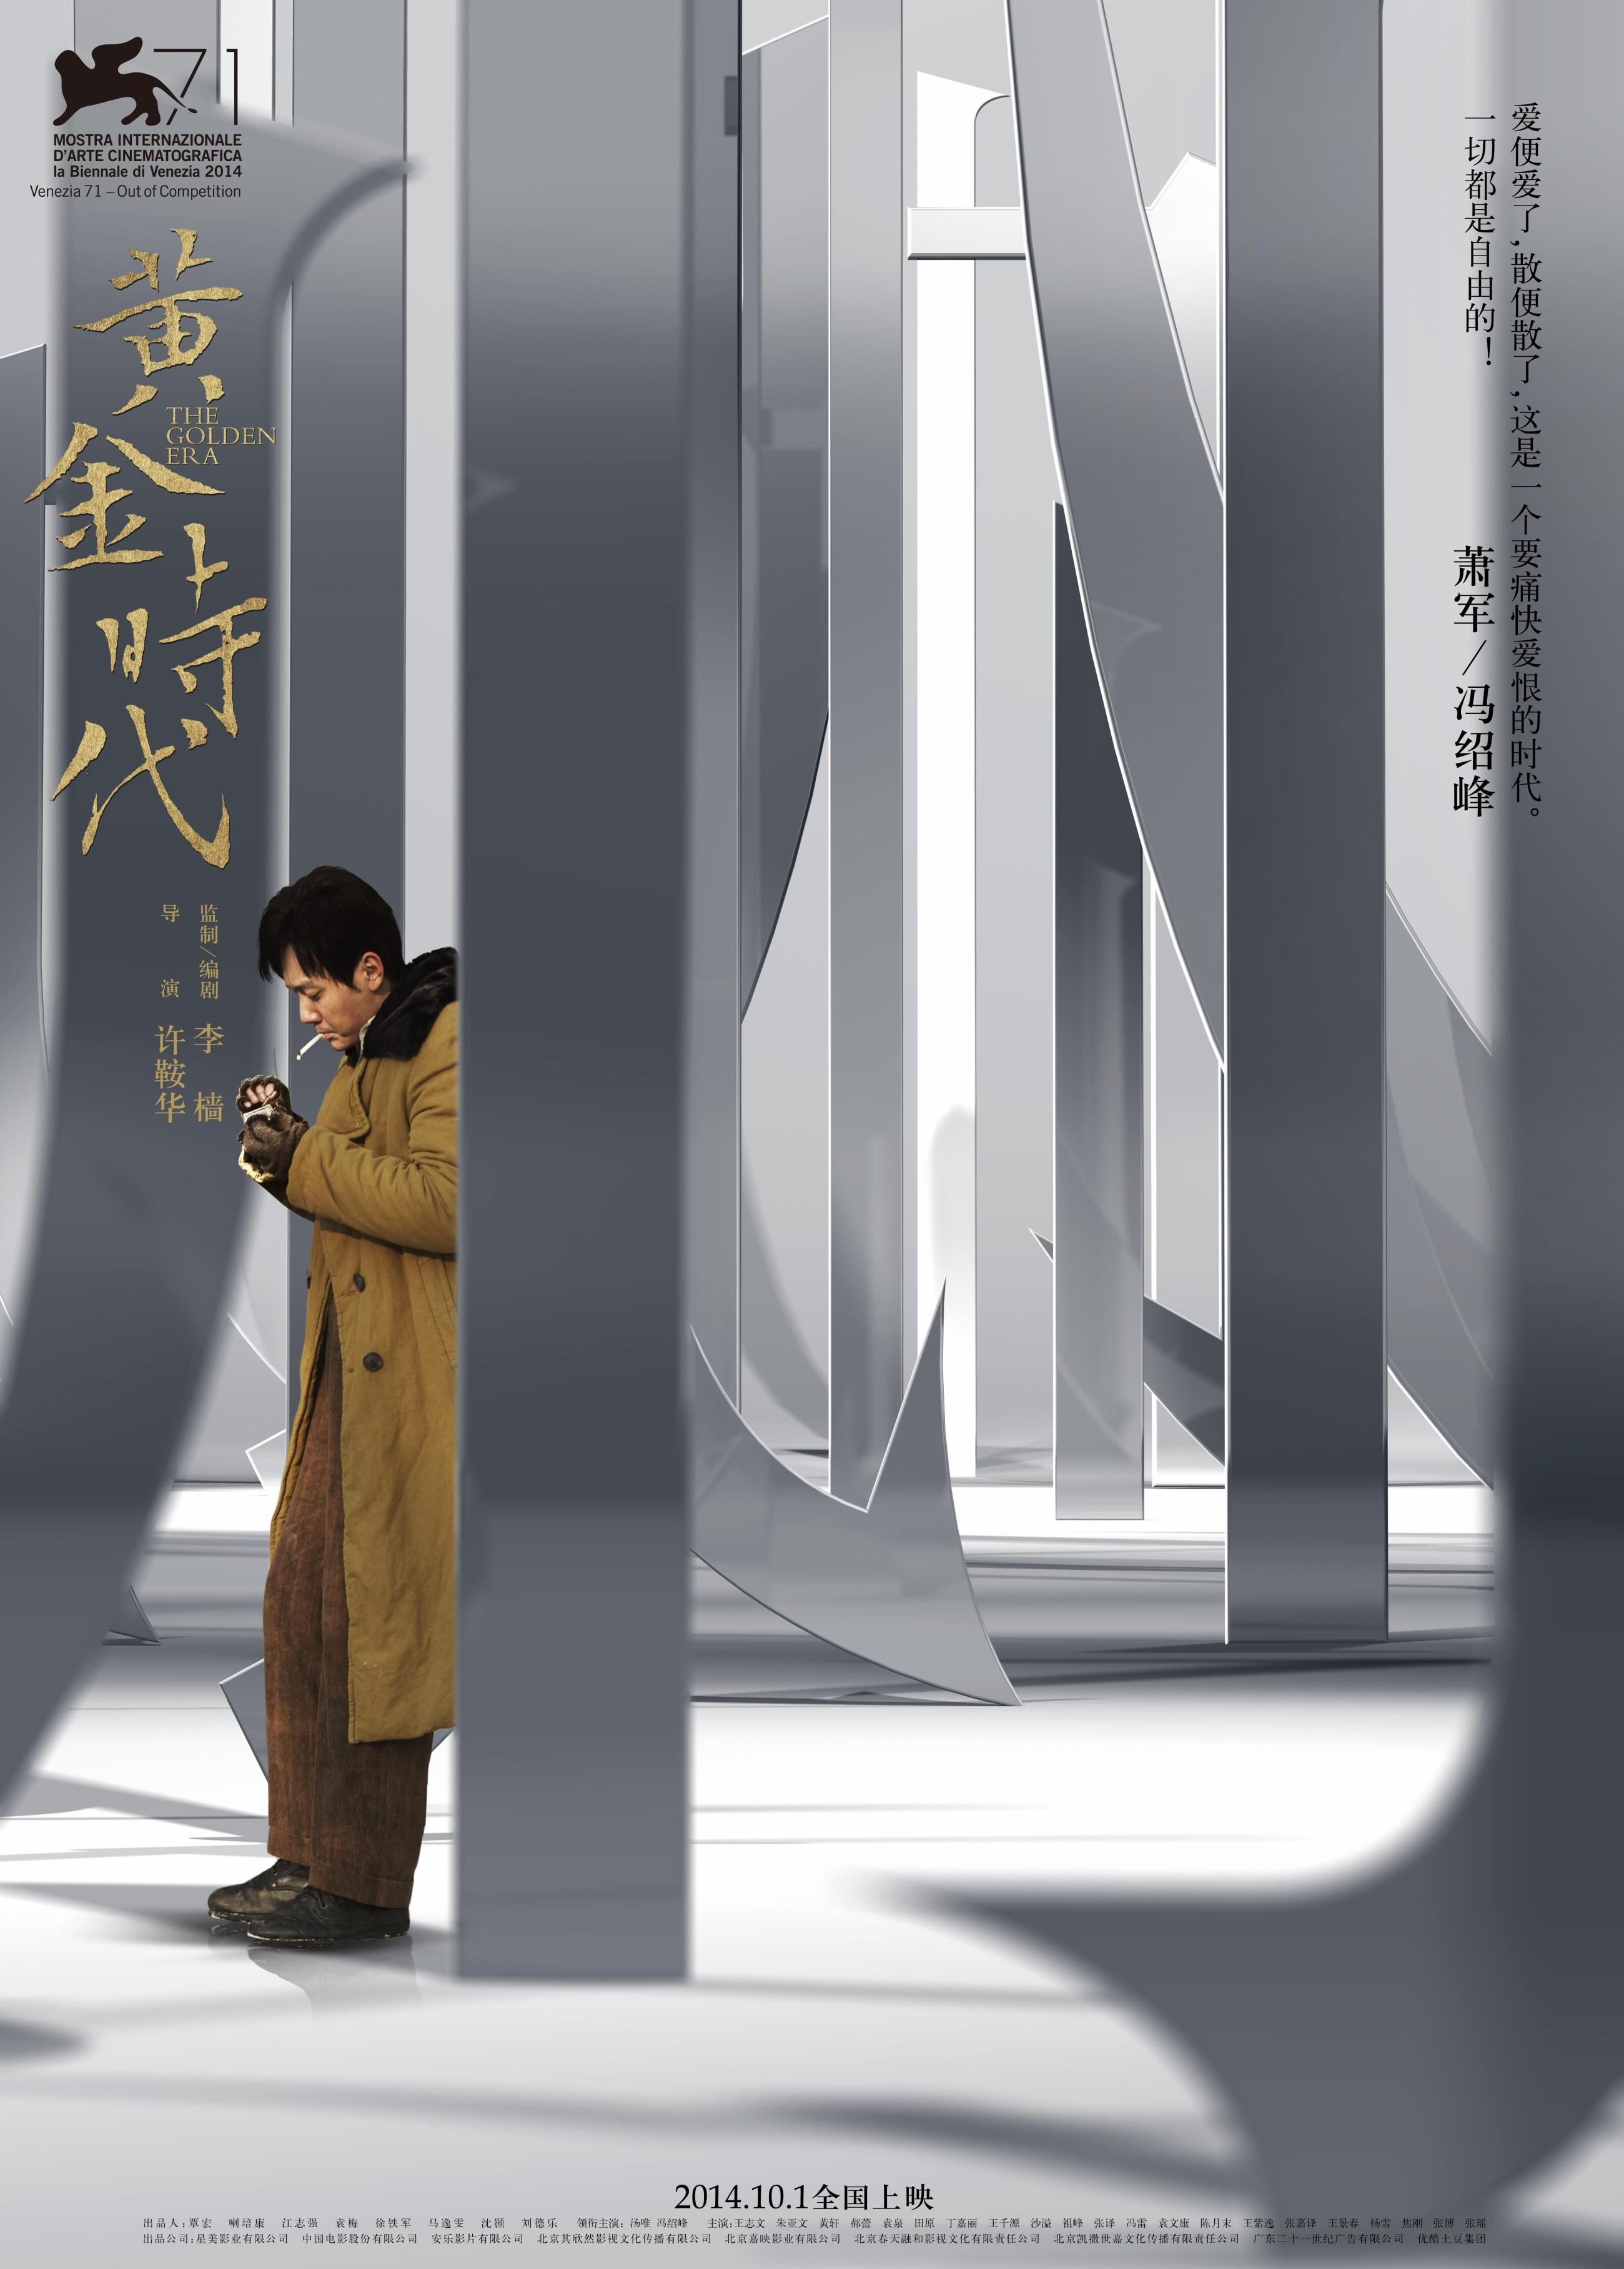 плакат фильма характер-постер Золотая эпоха*